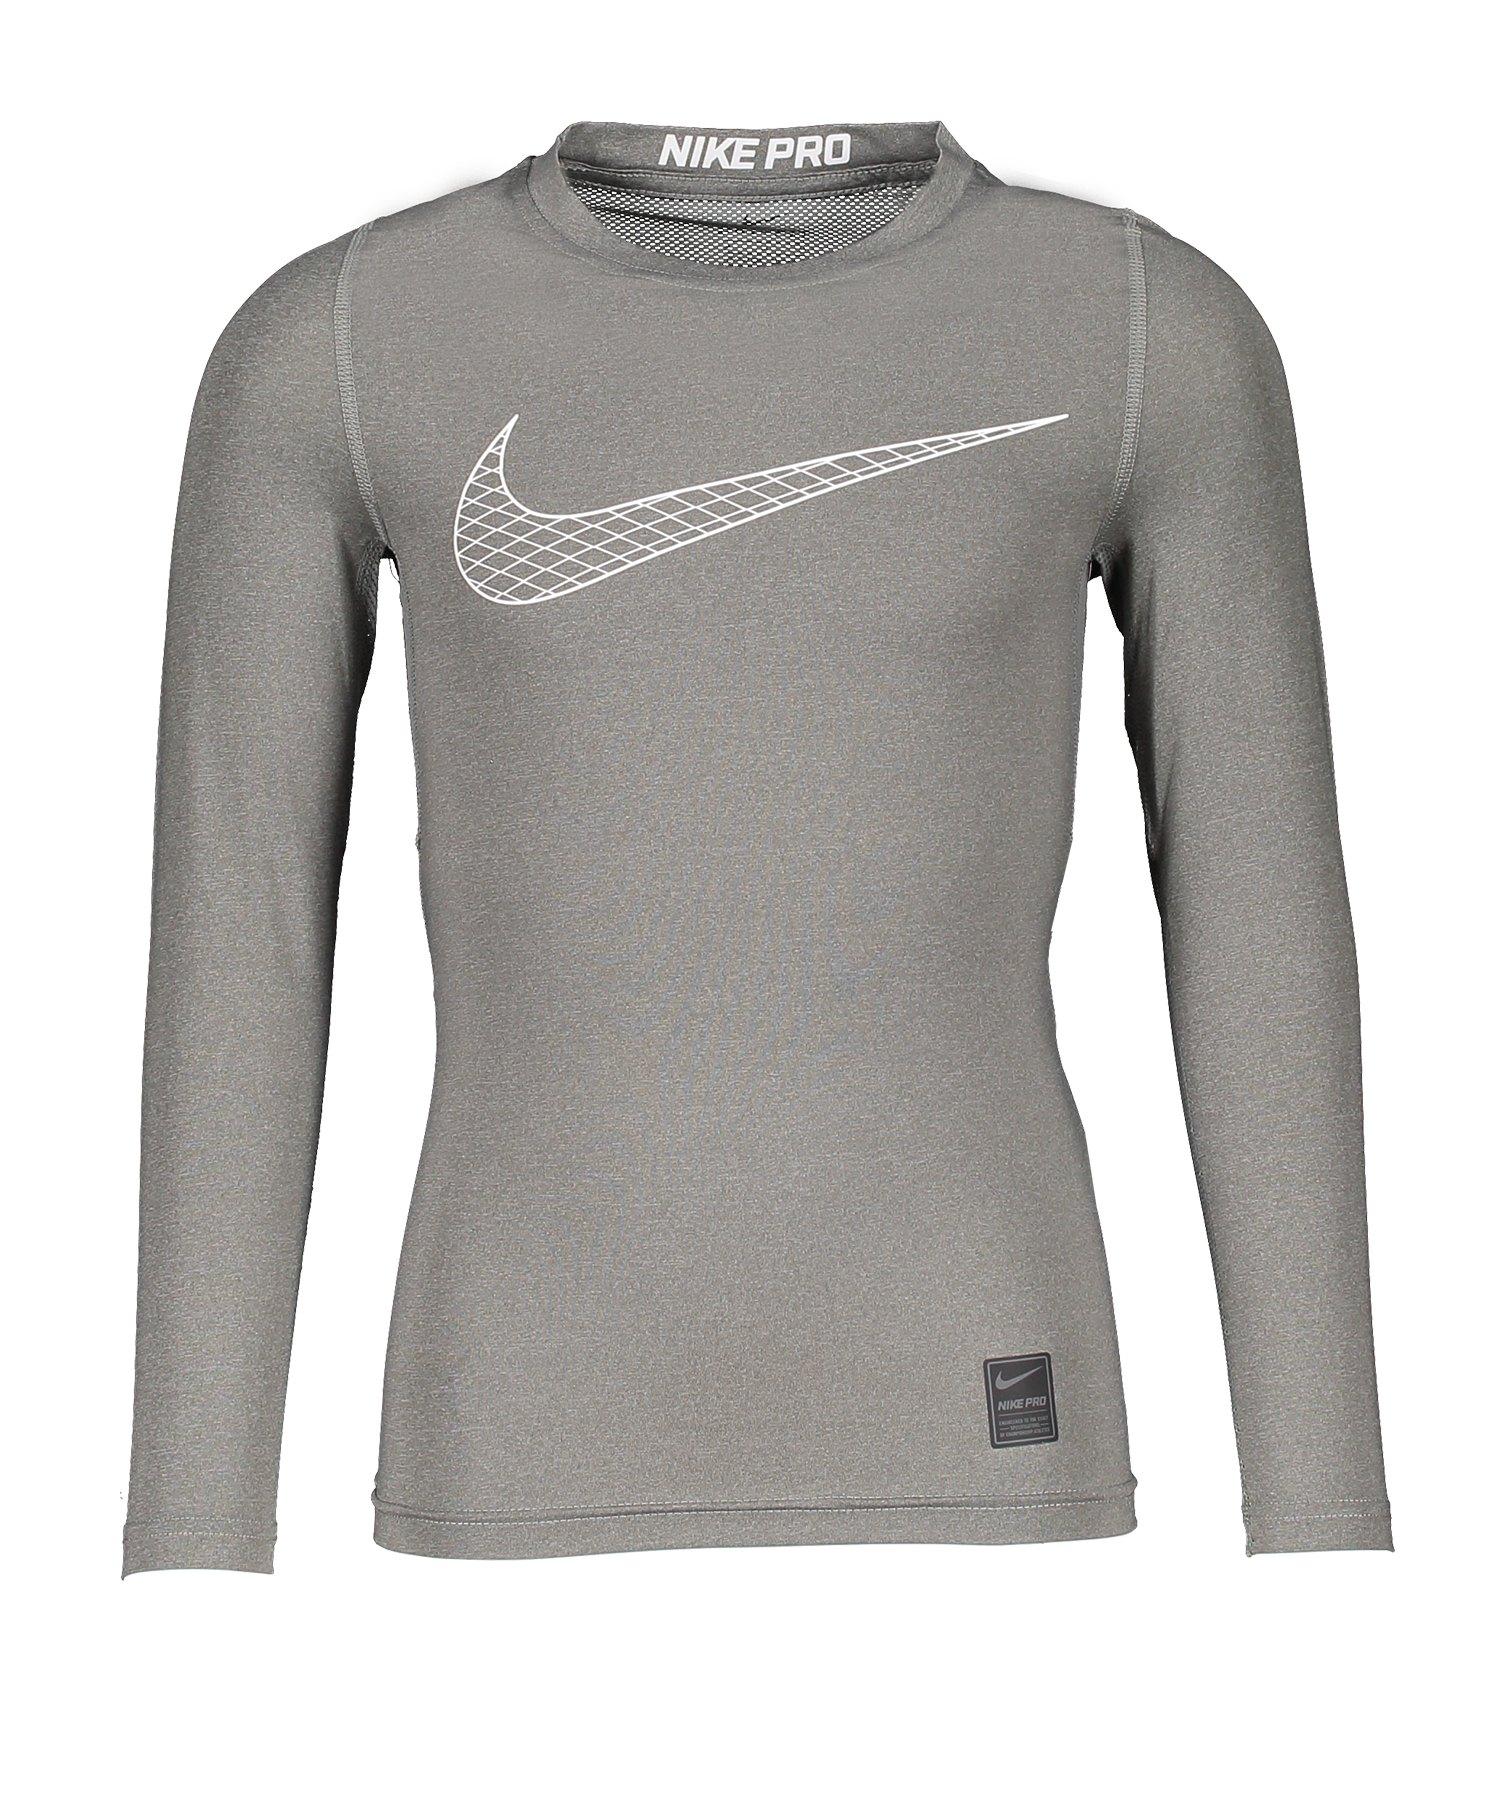 Nike Pro Longsleeve Shirt Kids Grau F091 - grau